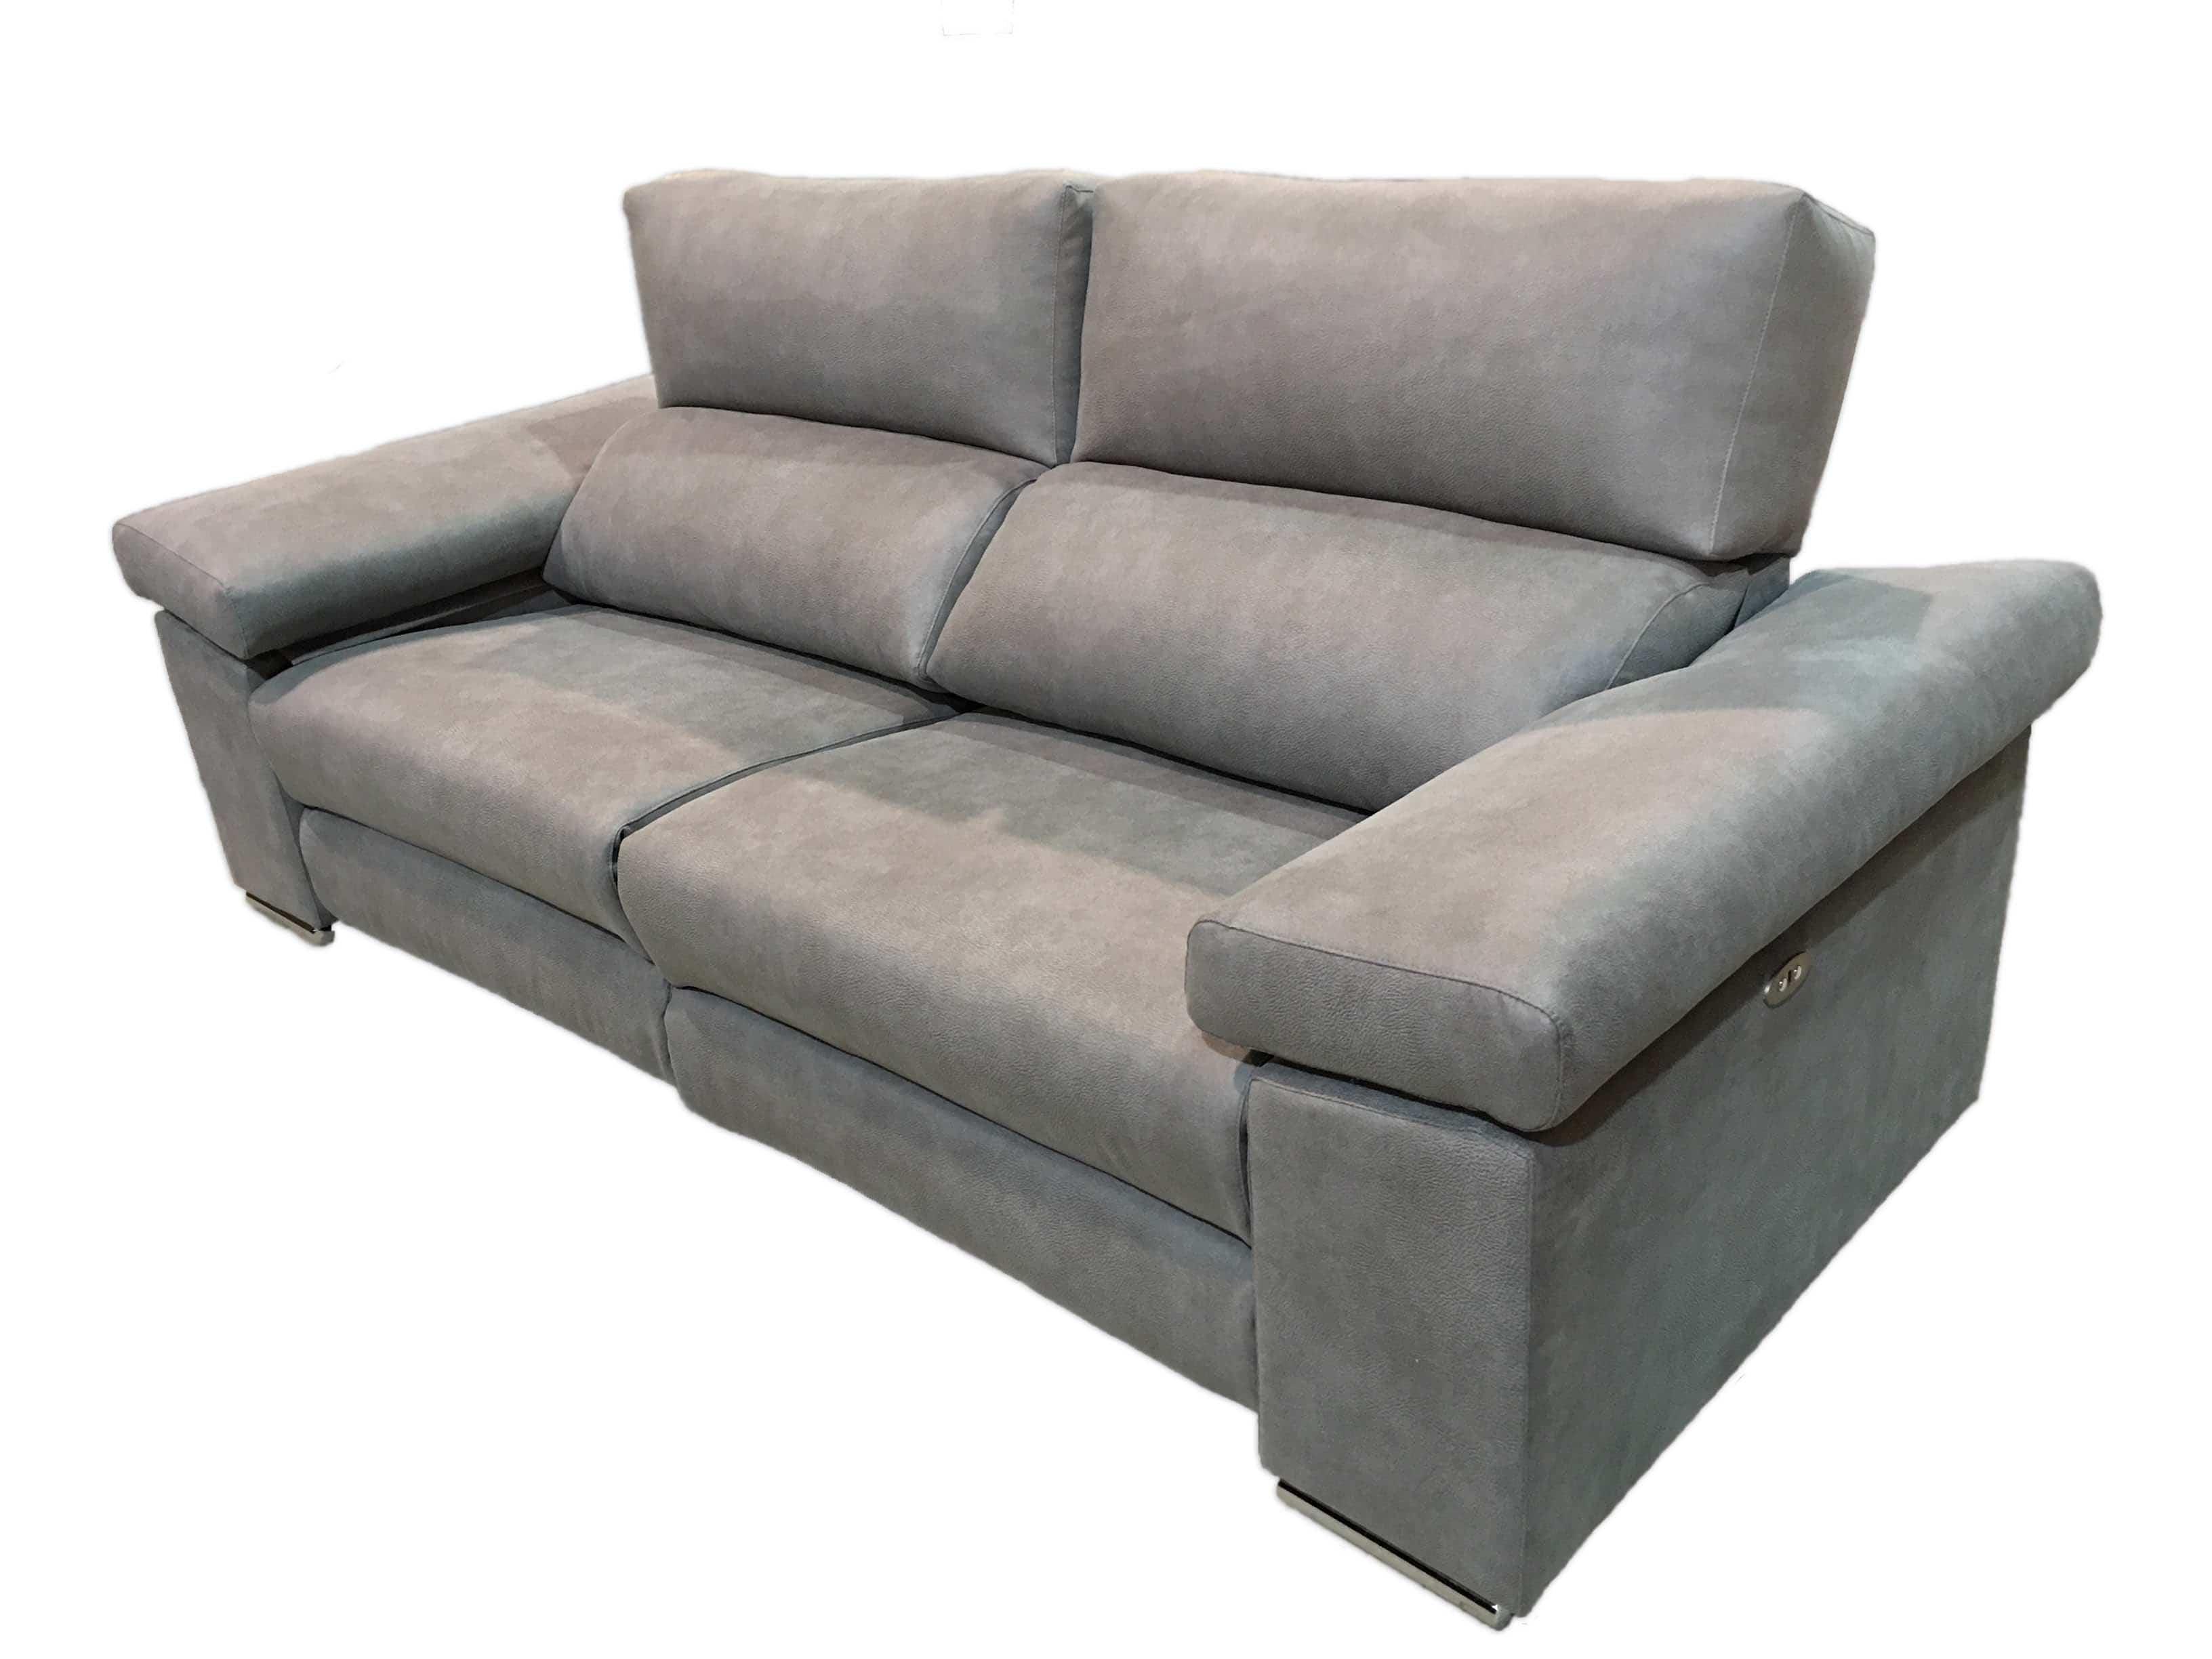 7 diferentes tipos de sofás pensados para decorar tu salón 4